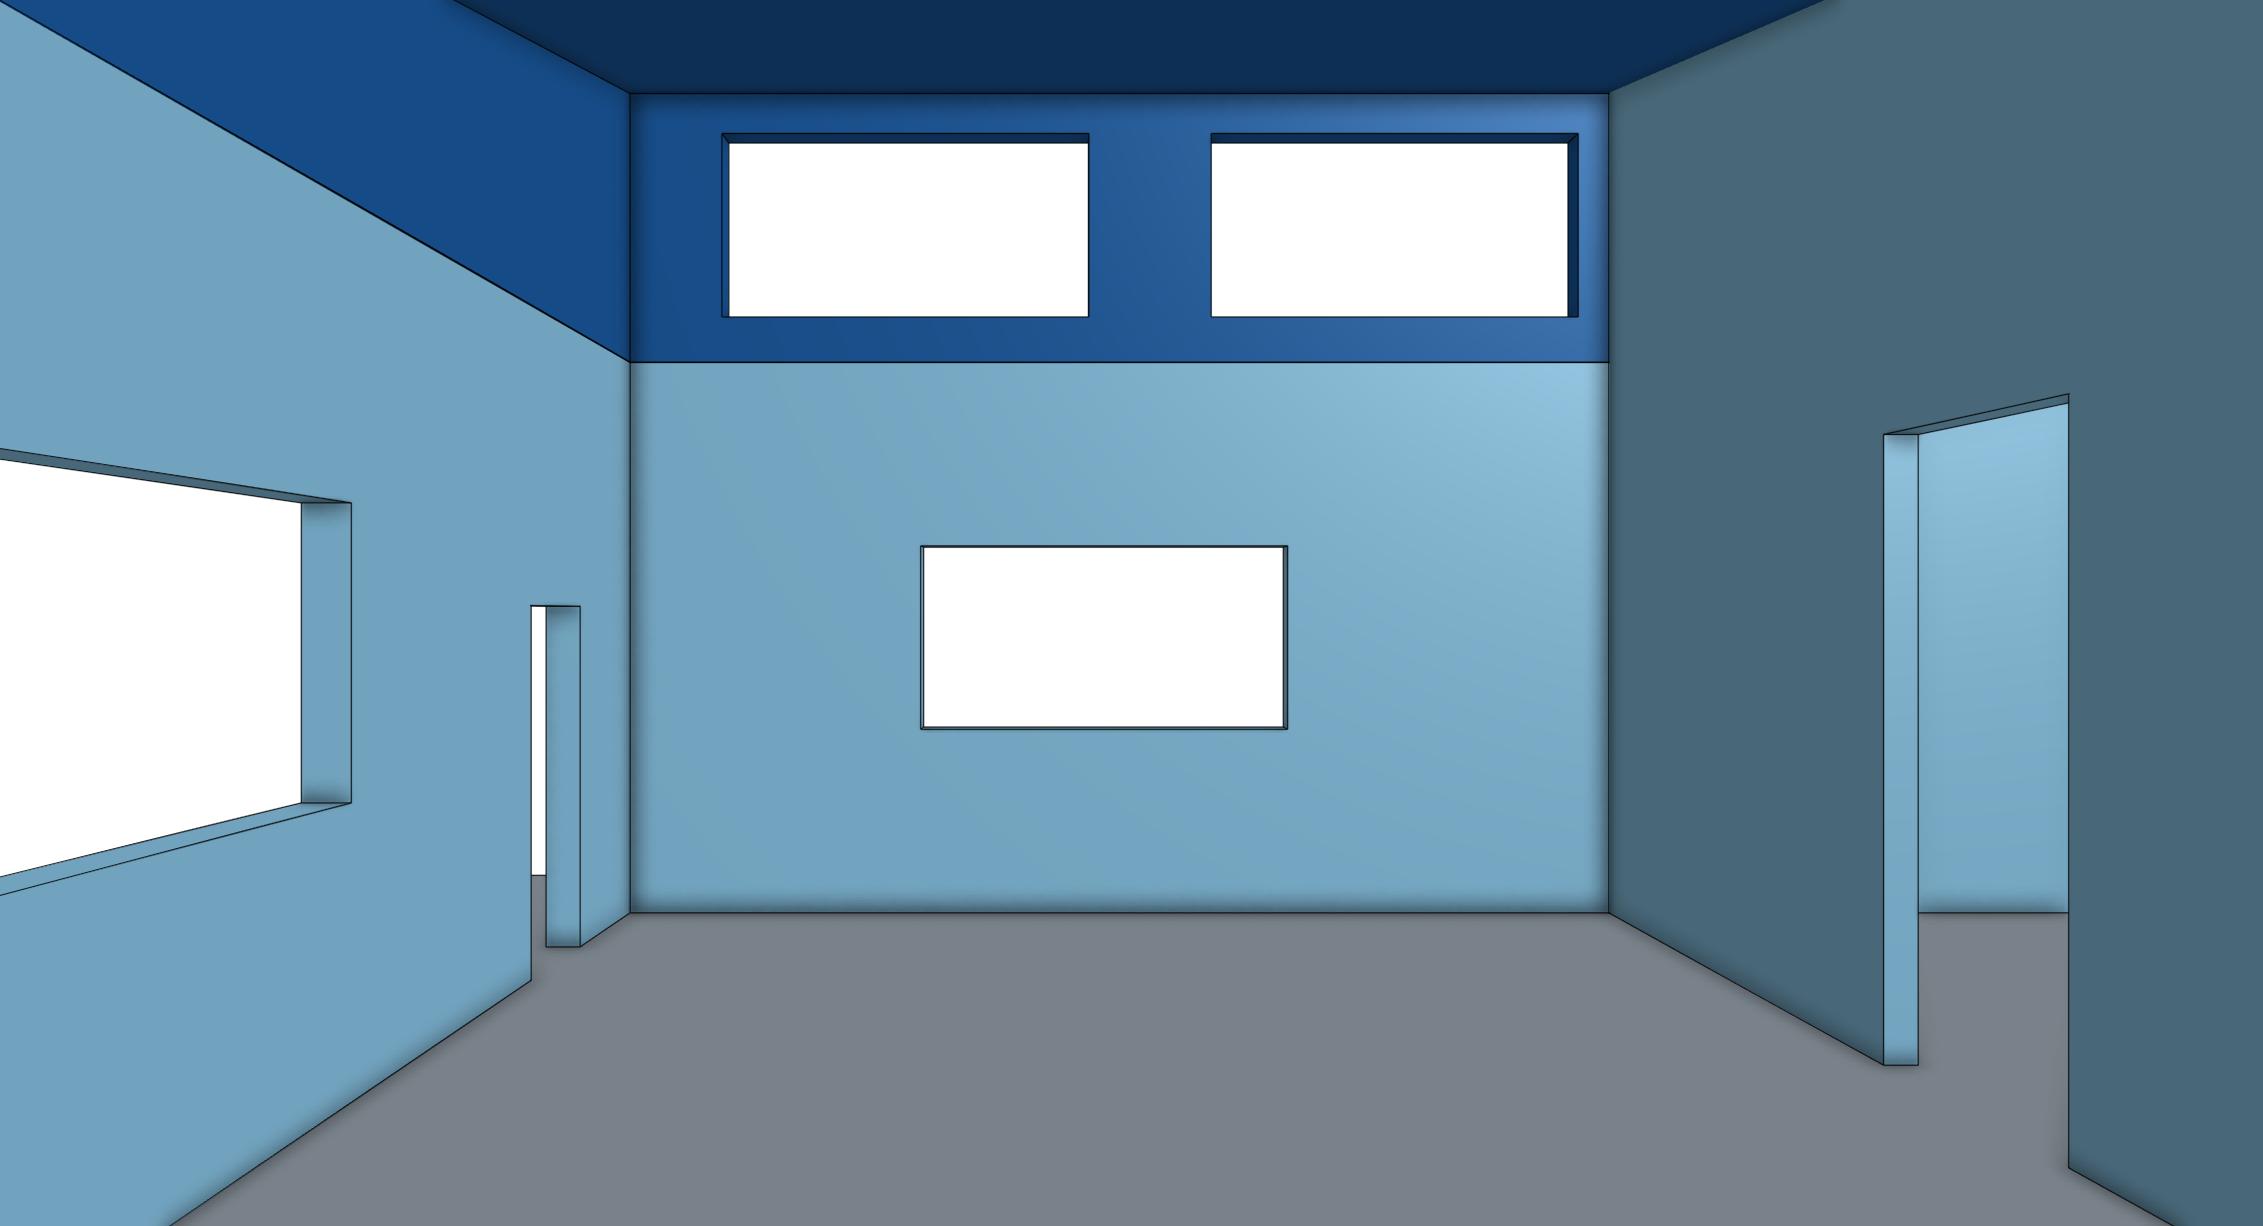 Eye-level view inside office space looking toward garage door side of building